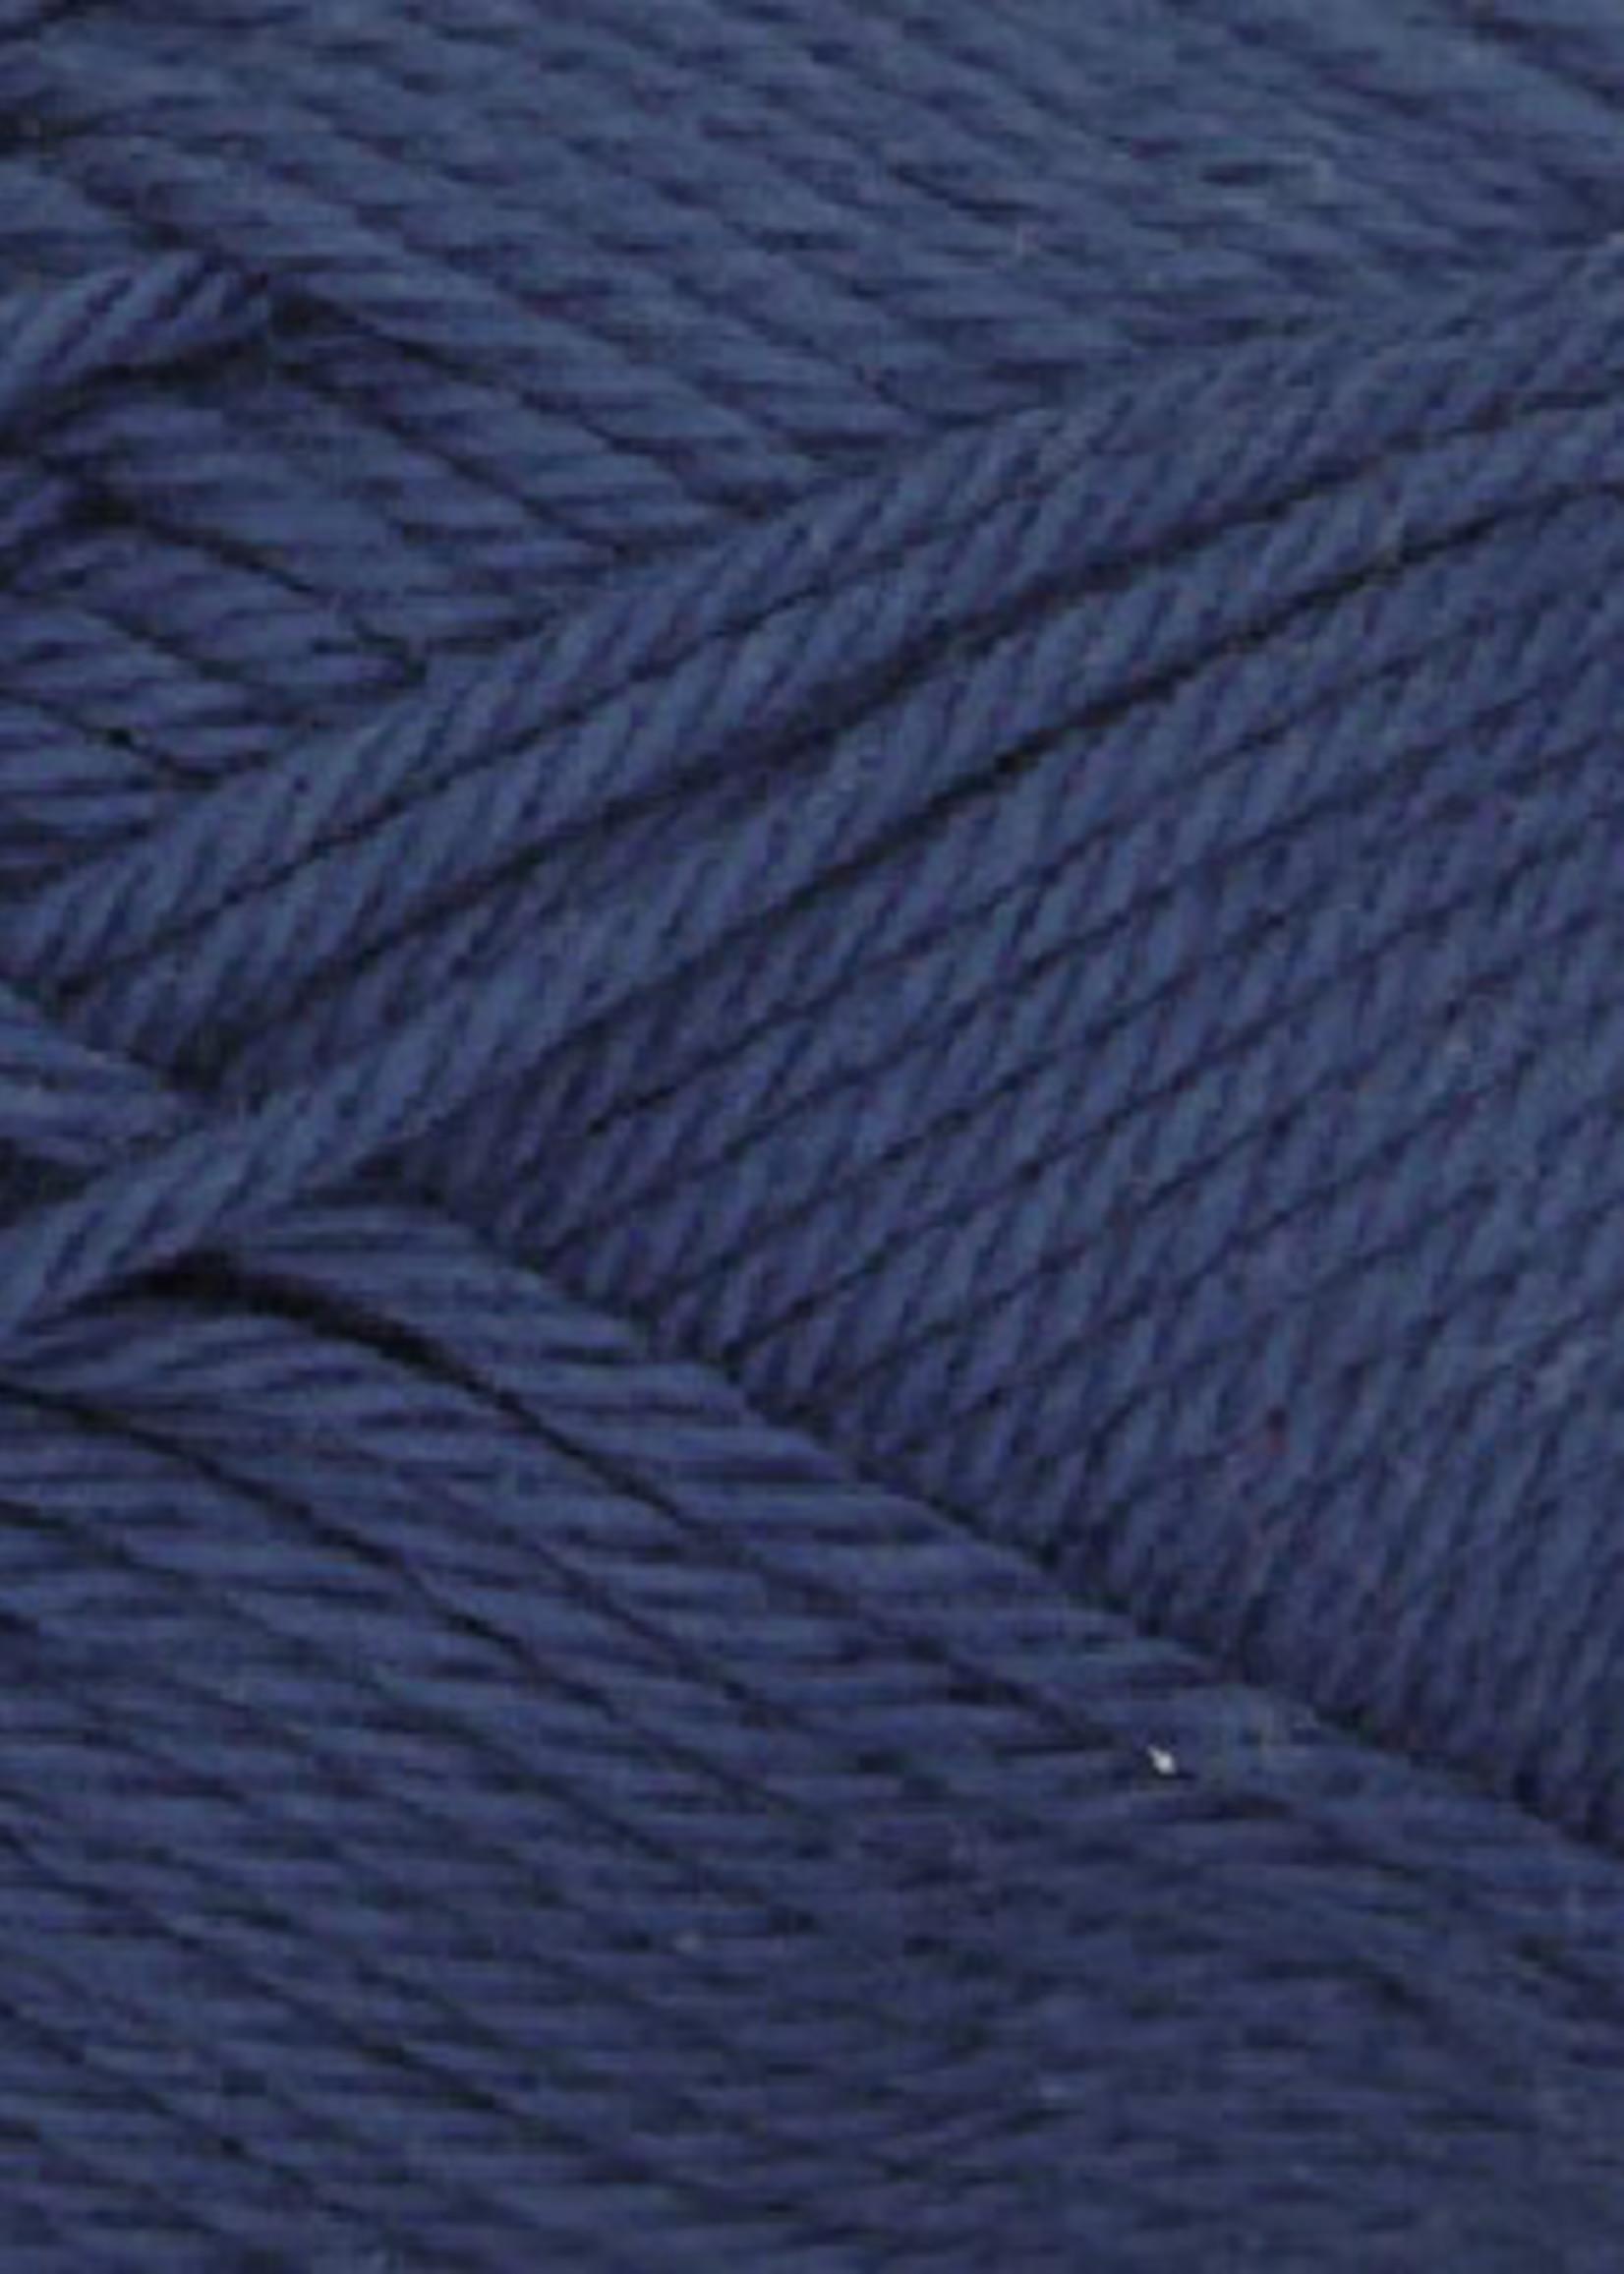 Estelle Yarns Sudz Cotton #53946 Navy